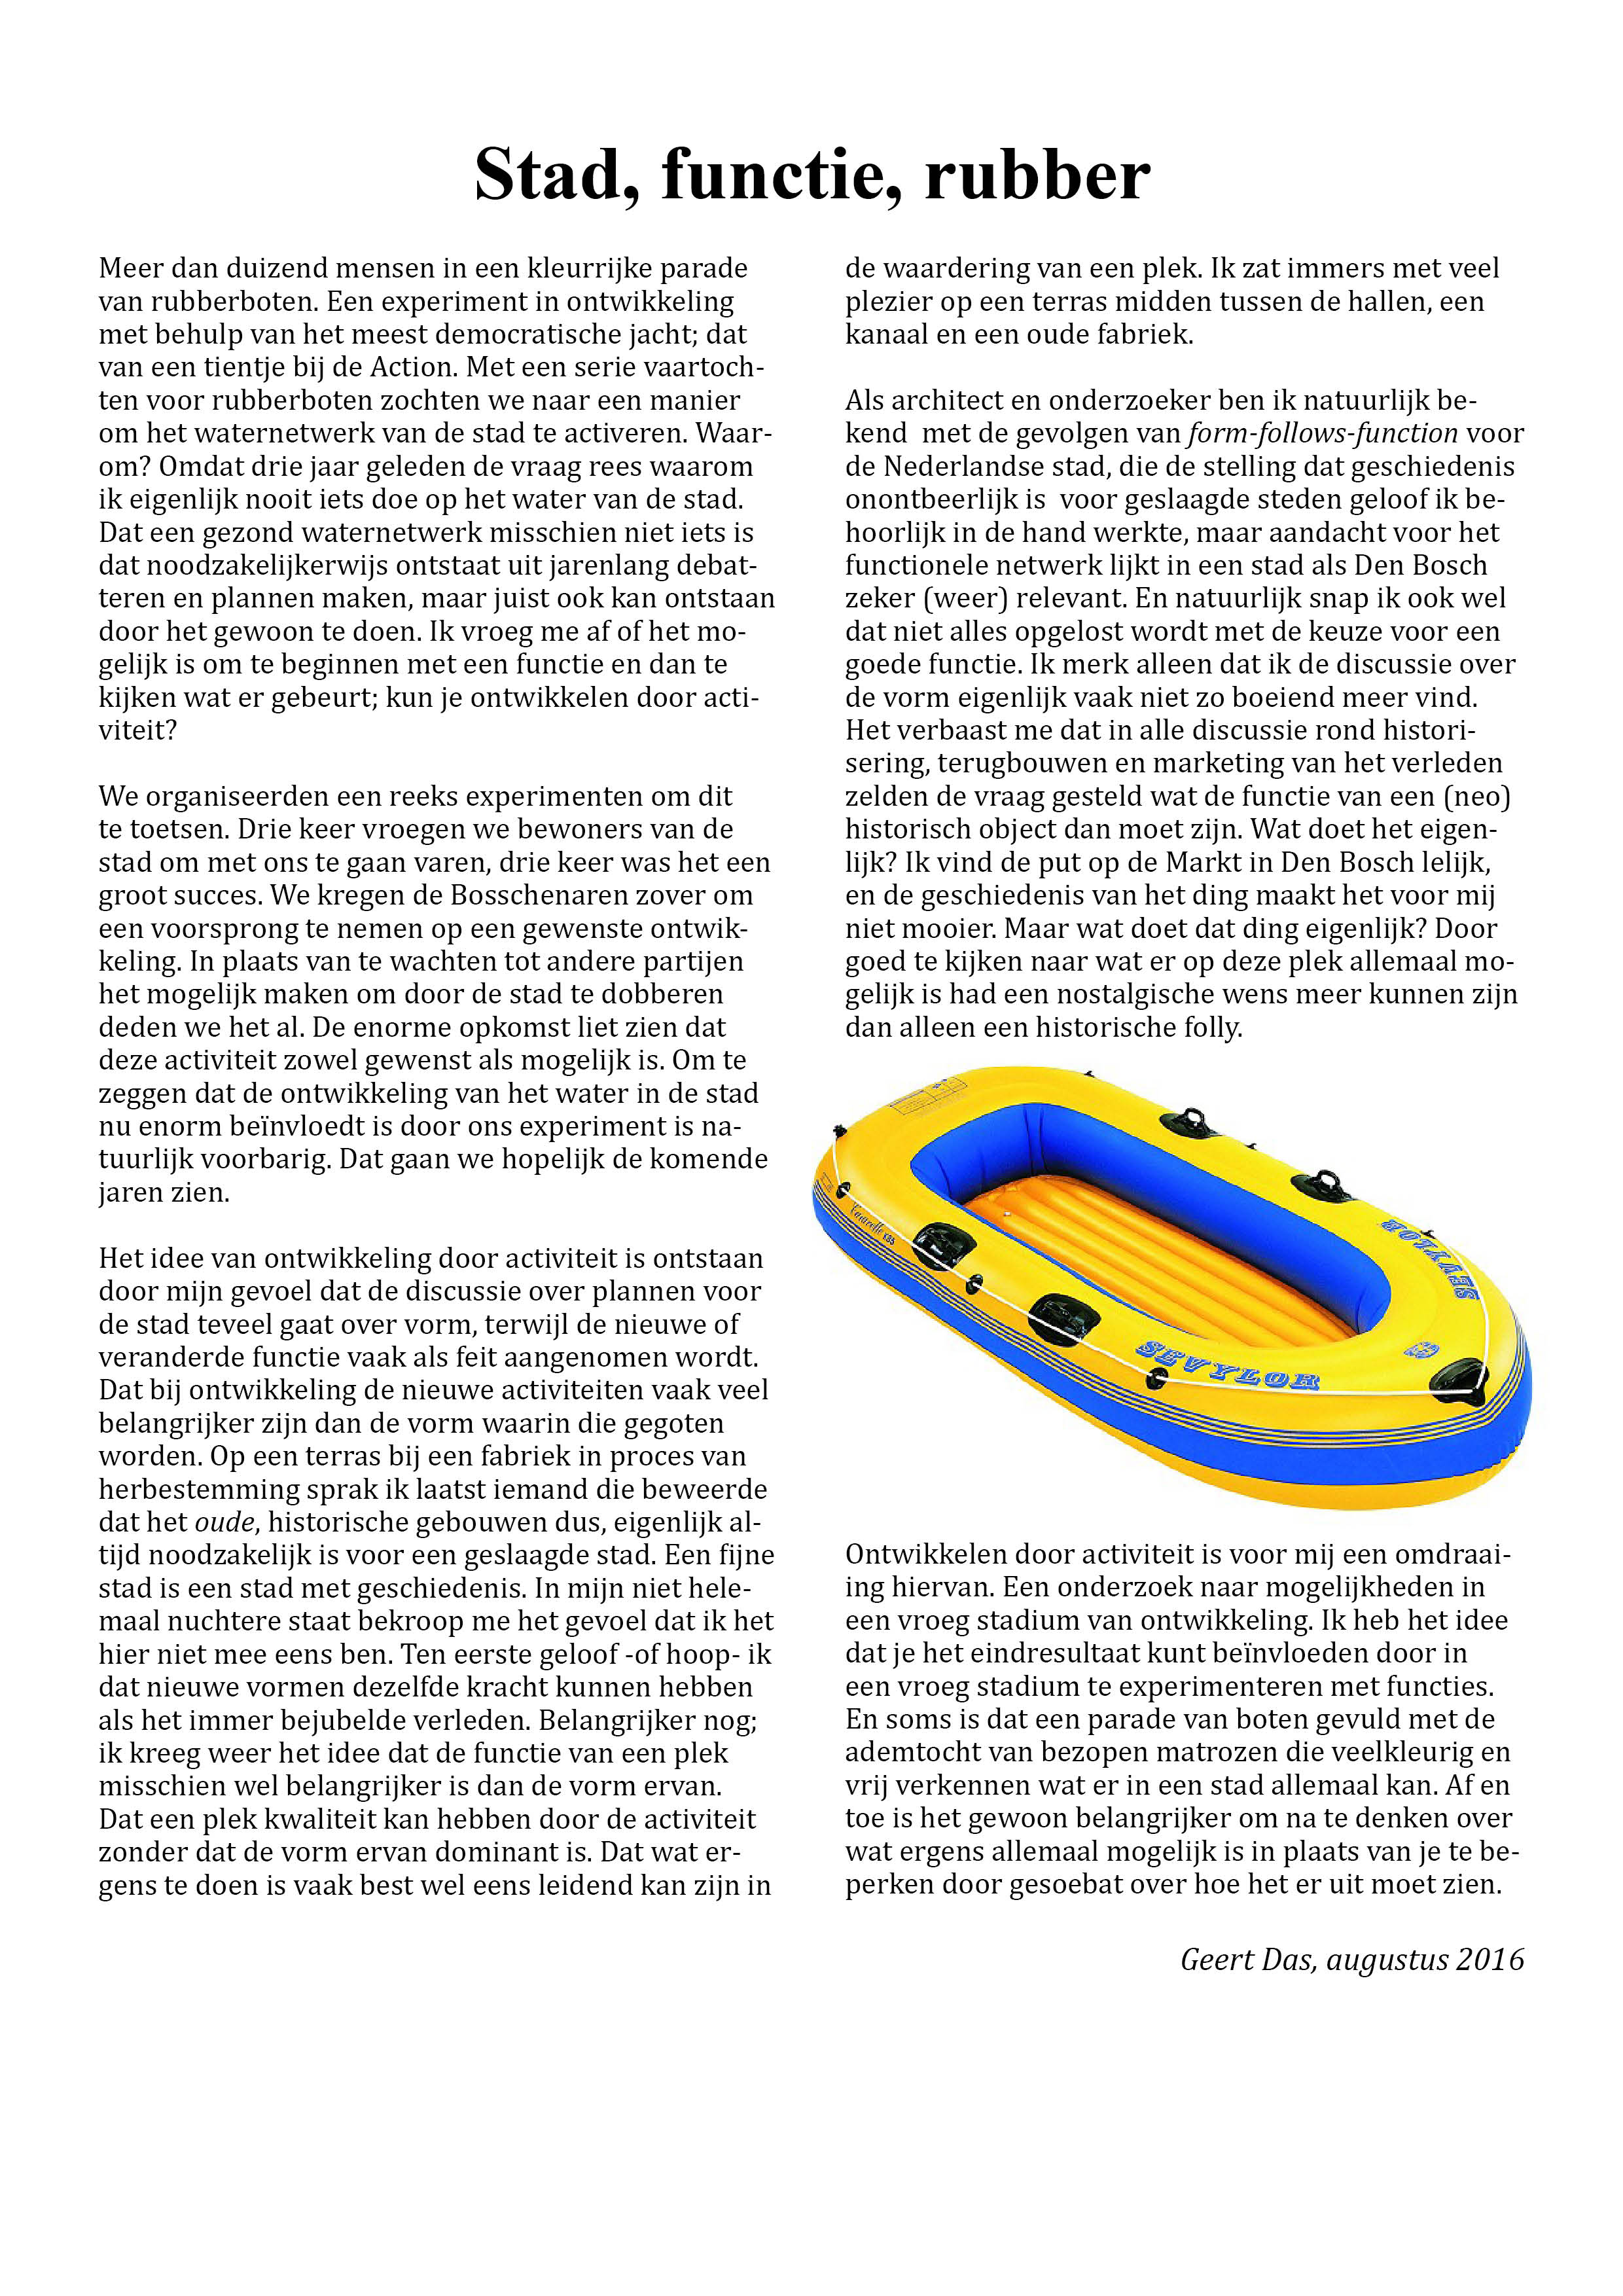 Stad functie rubber